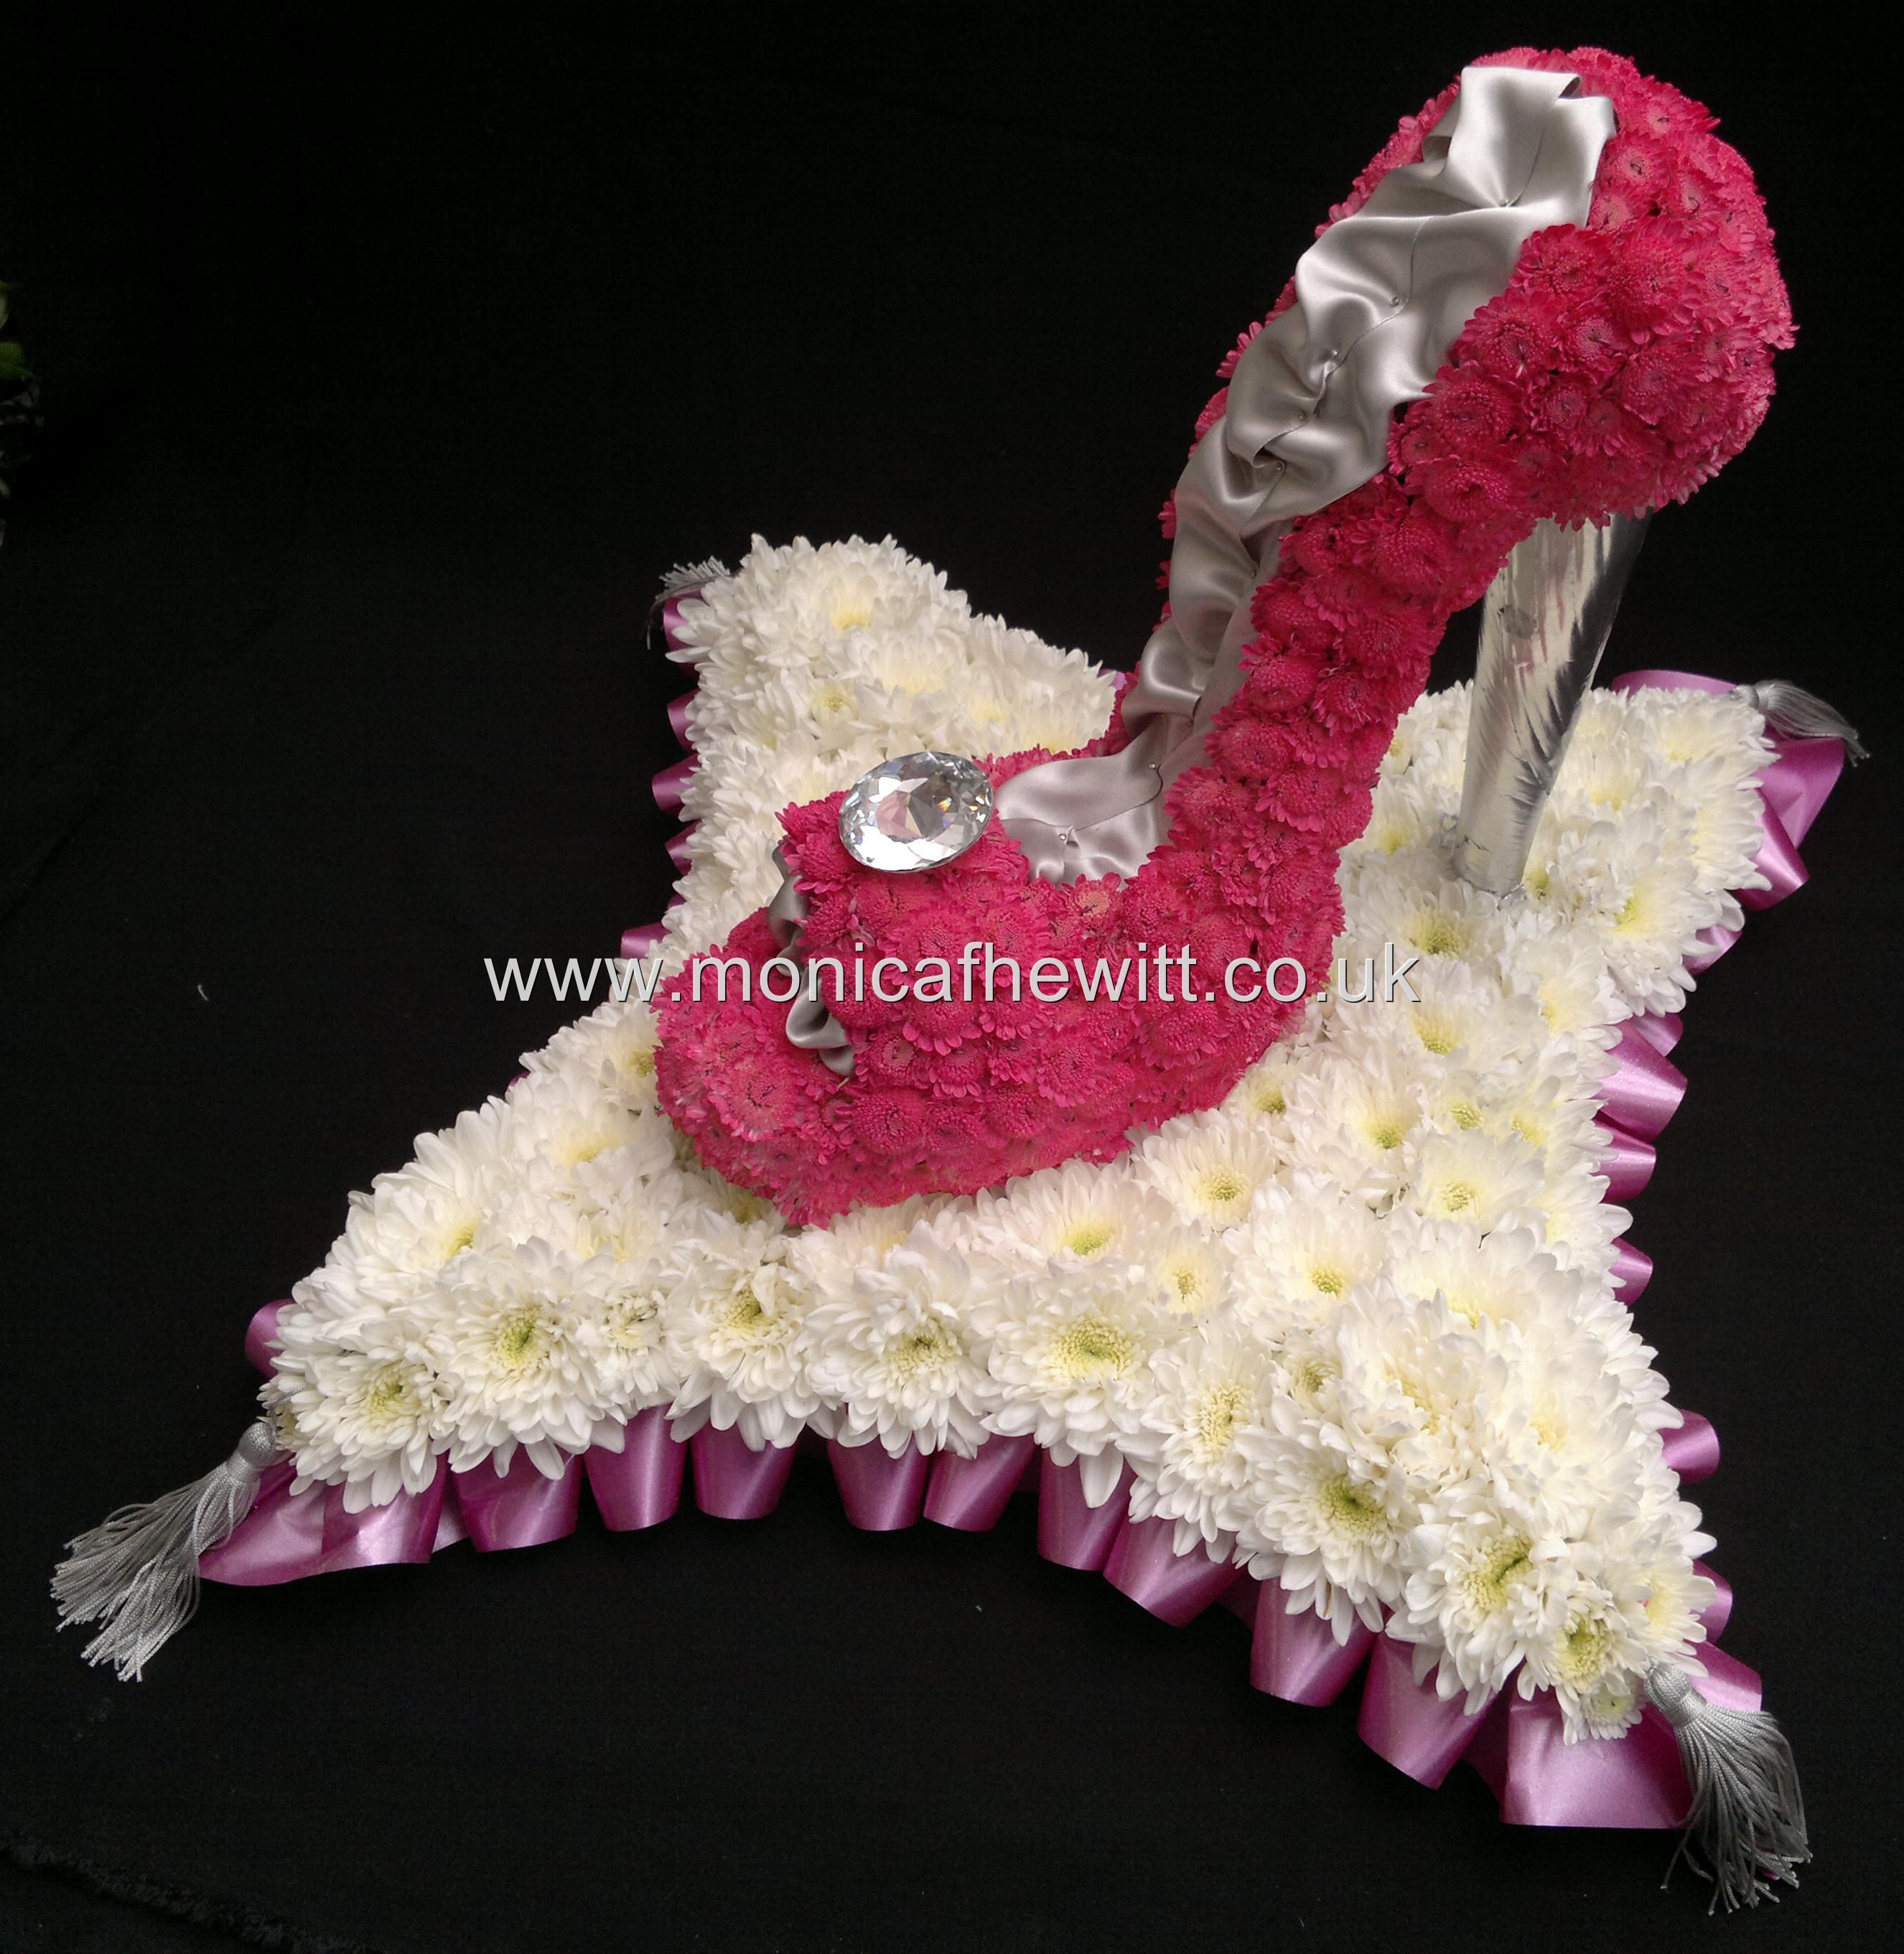 High heel shoe funeral flowers monica f hewitt florist sheffield high heel shoe funeral flowers monica f hewitt florist sheffield dhlflorist Gallery